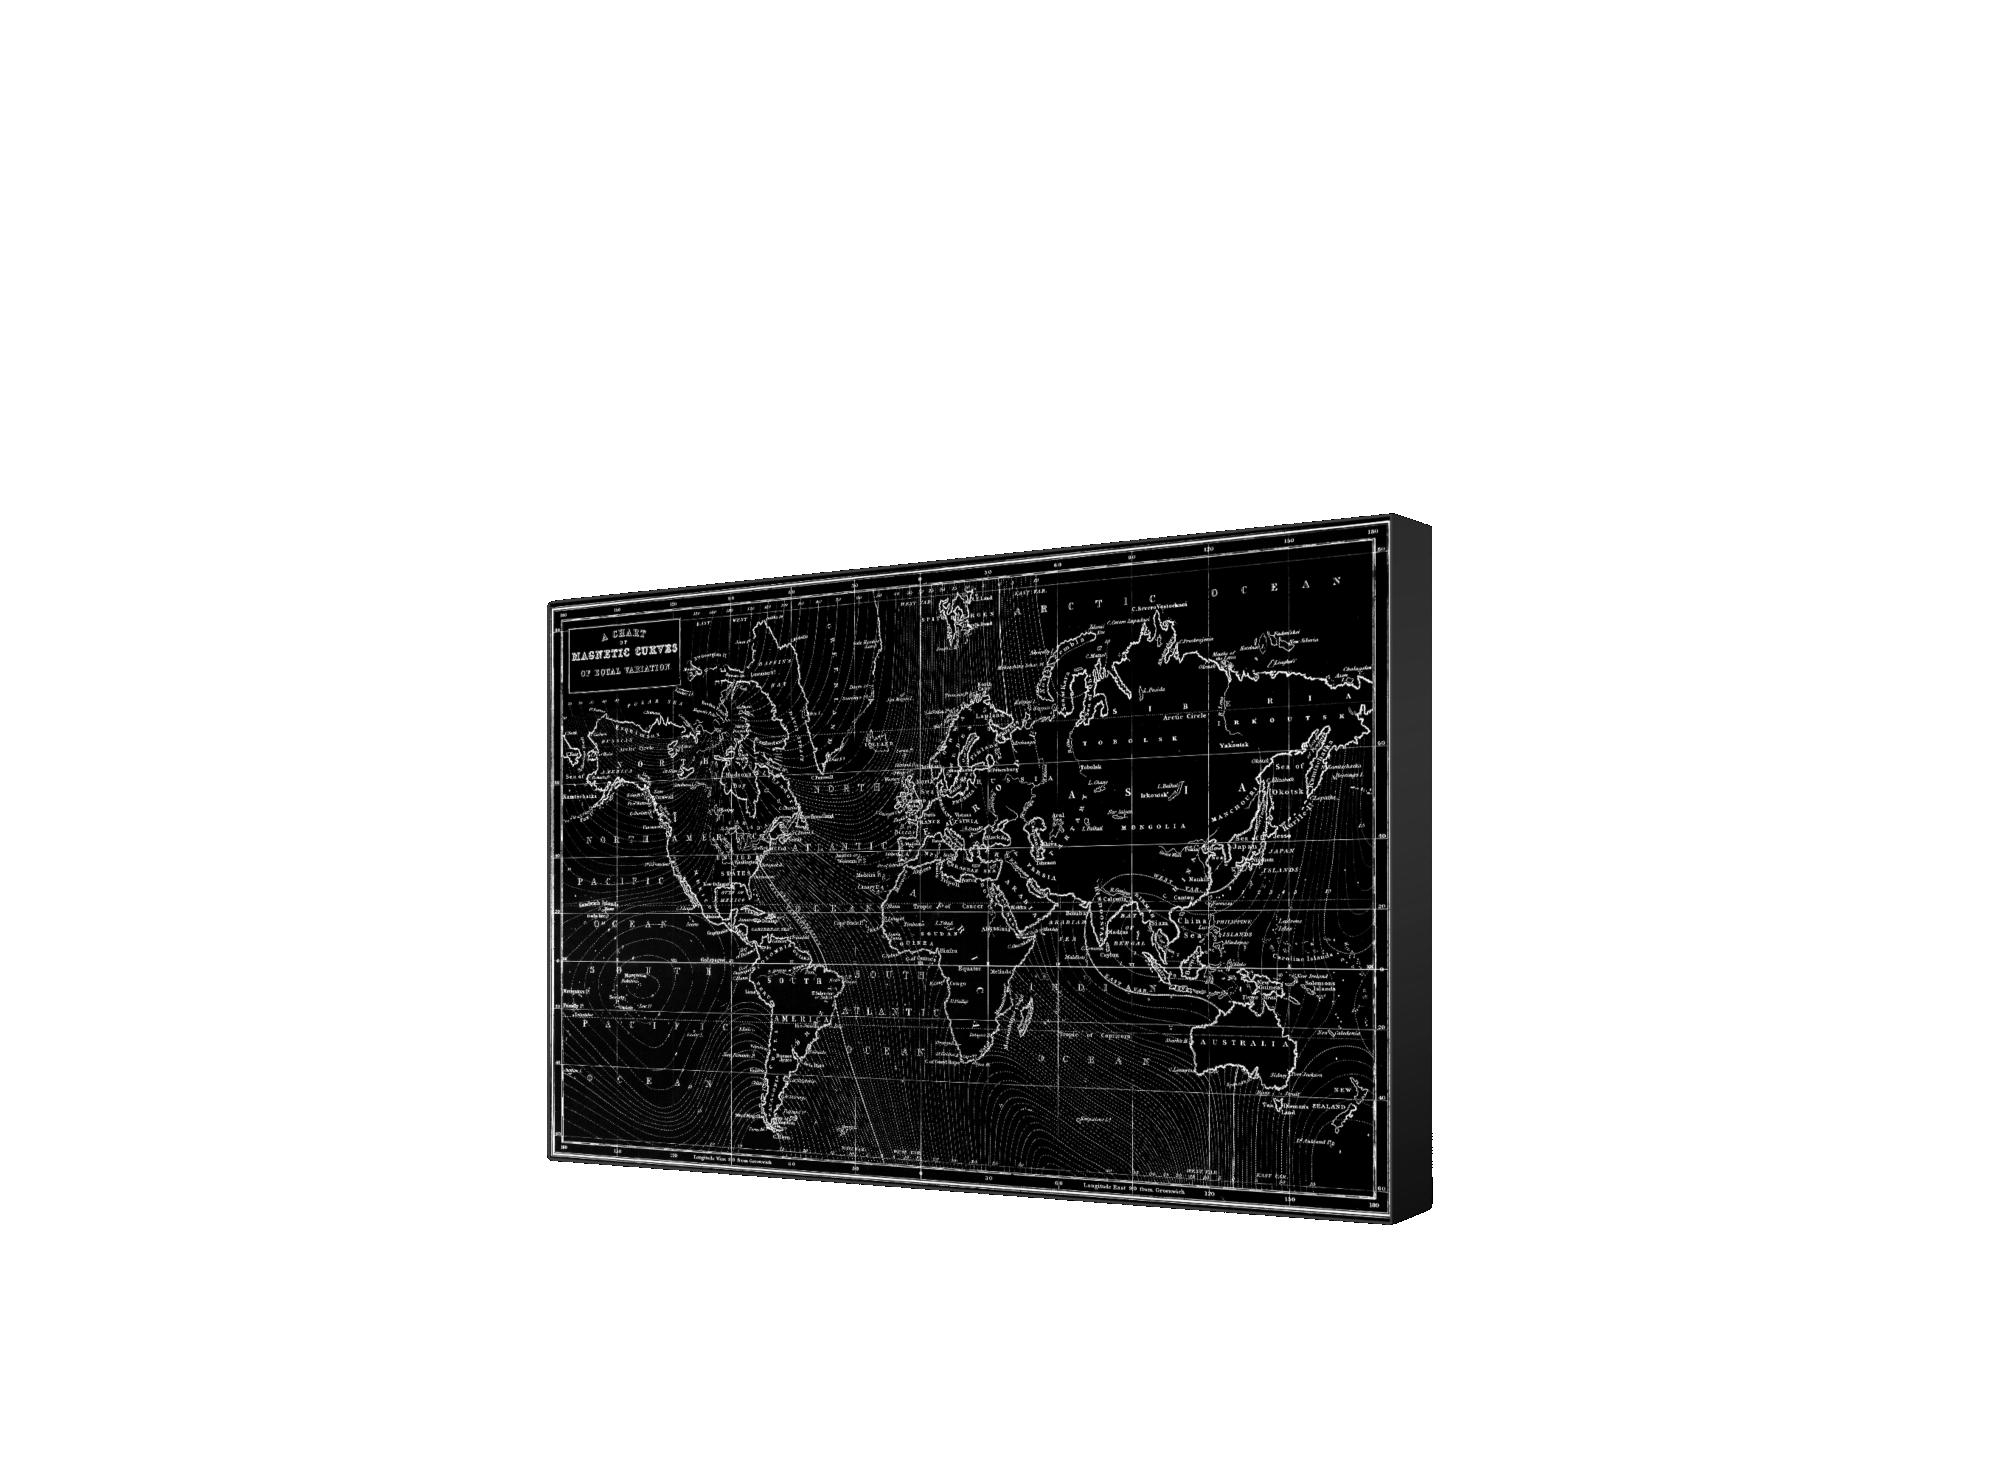 Affiche 60x80cm polyester laminee sur mdf avec cadre polystyrene - fi ...